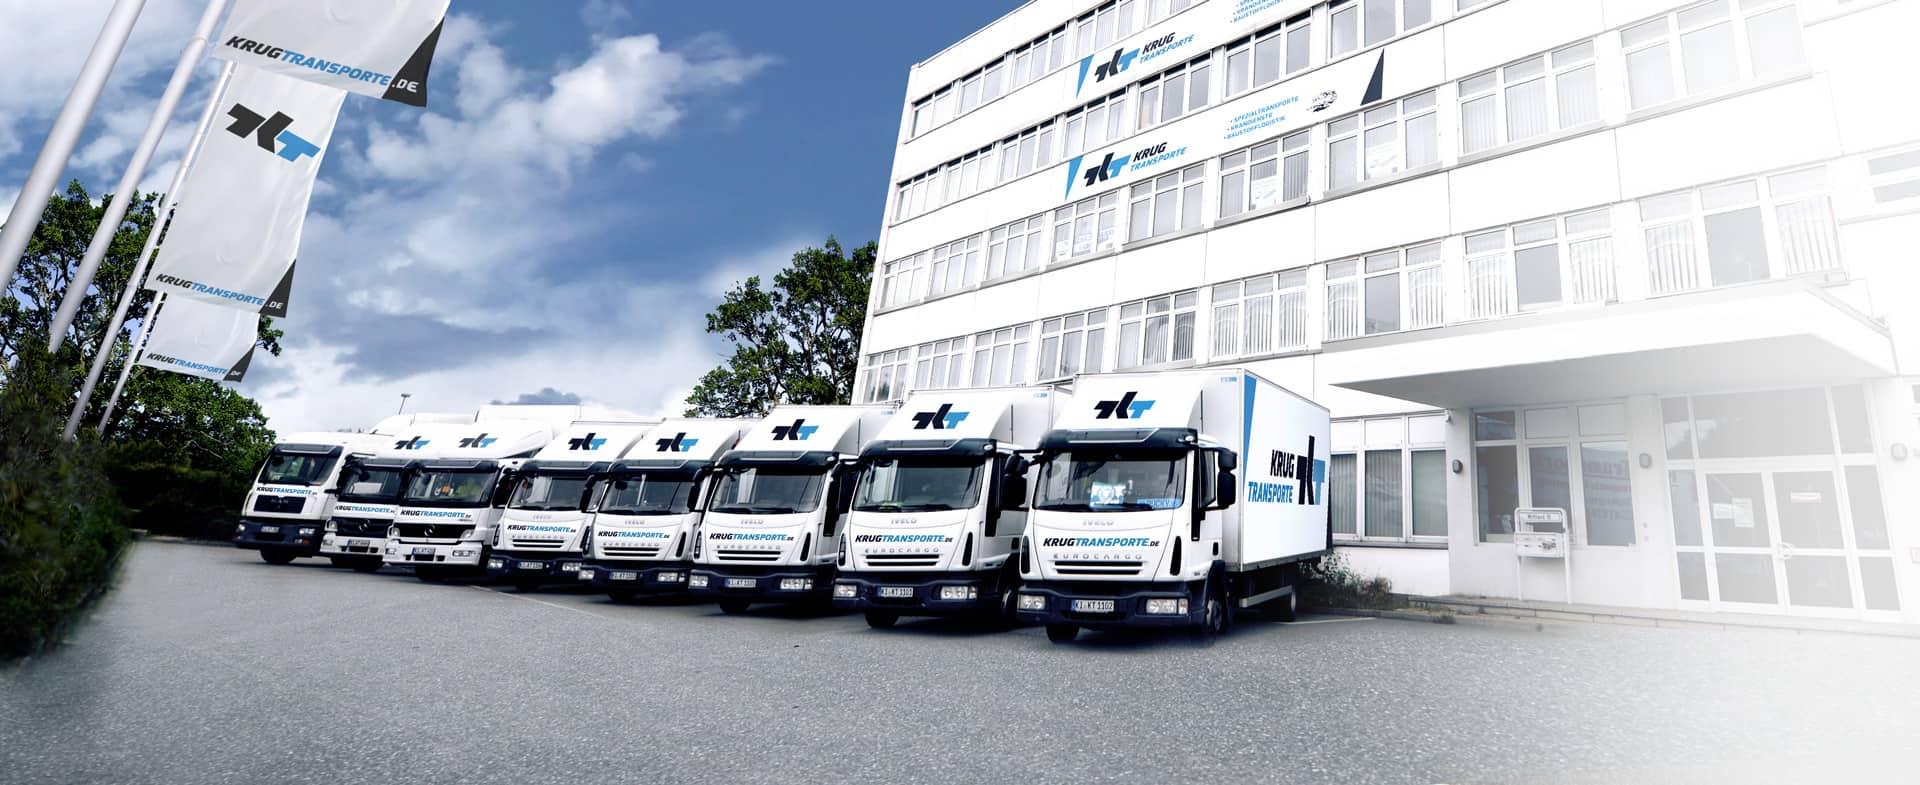 krug-transporte-wittland1